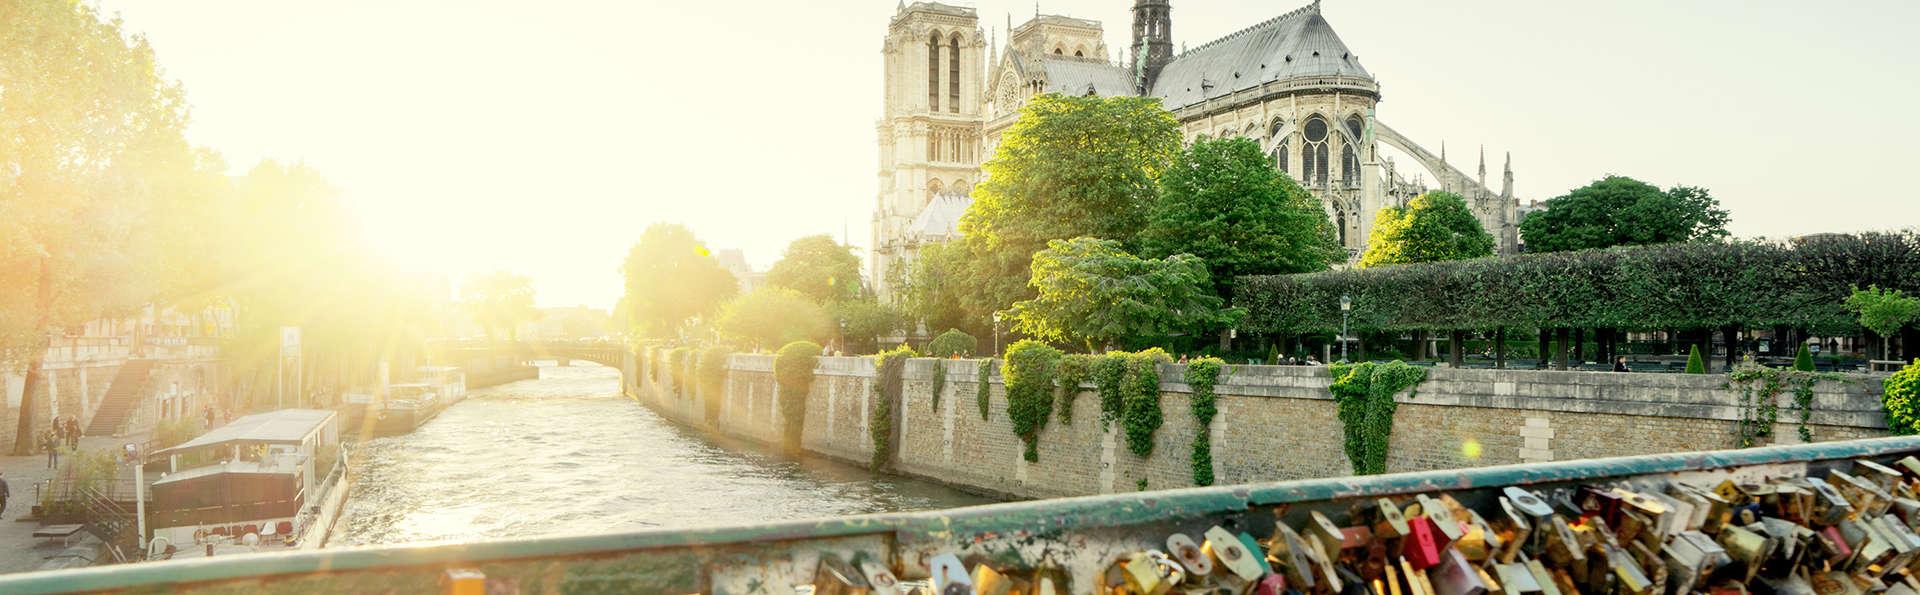 Maison Malesherbes - Edit_Paris.jpg